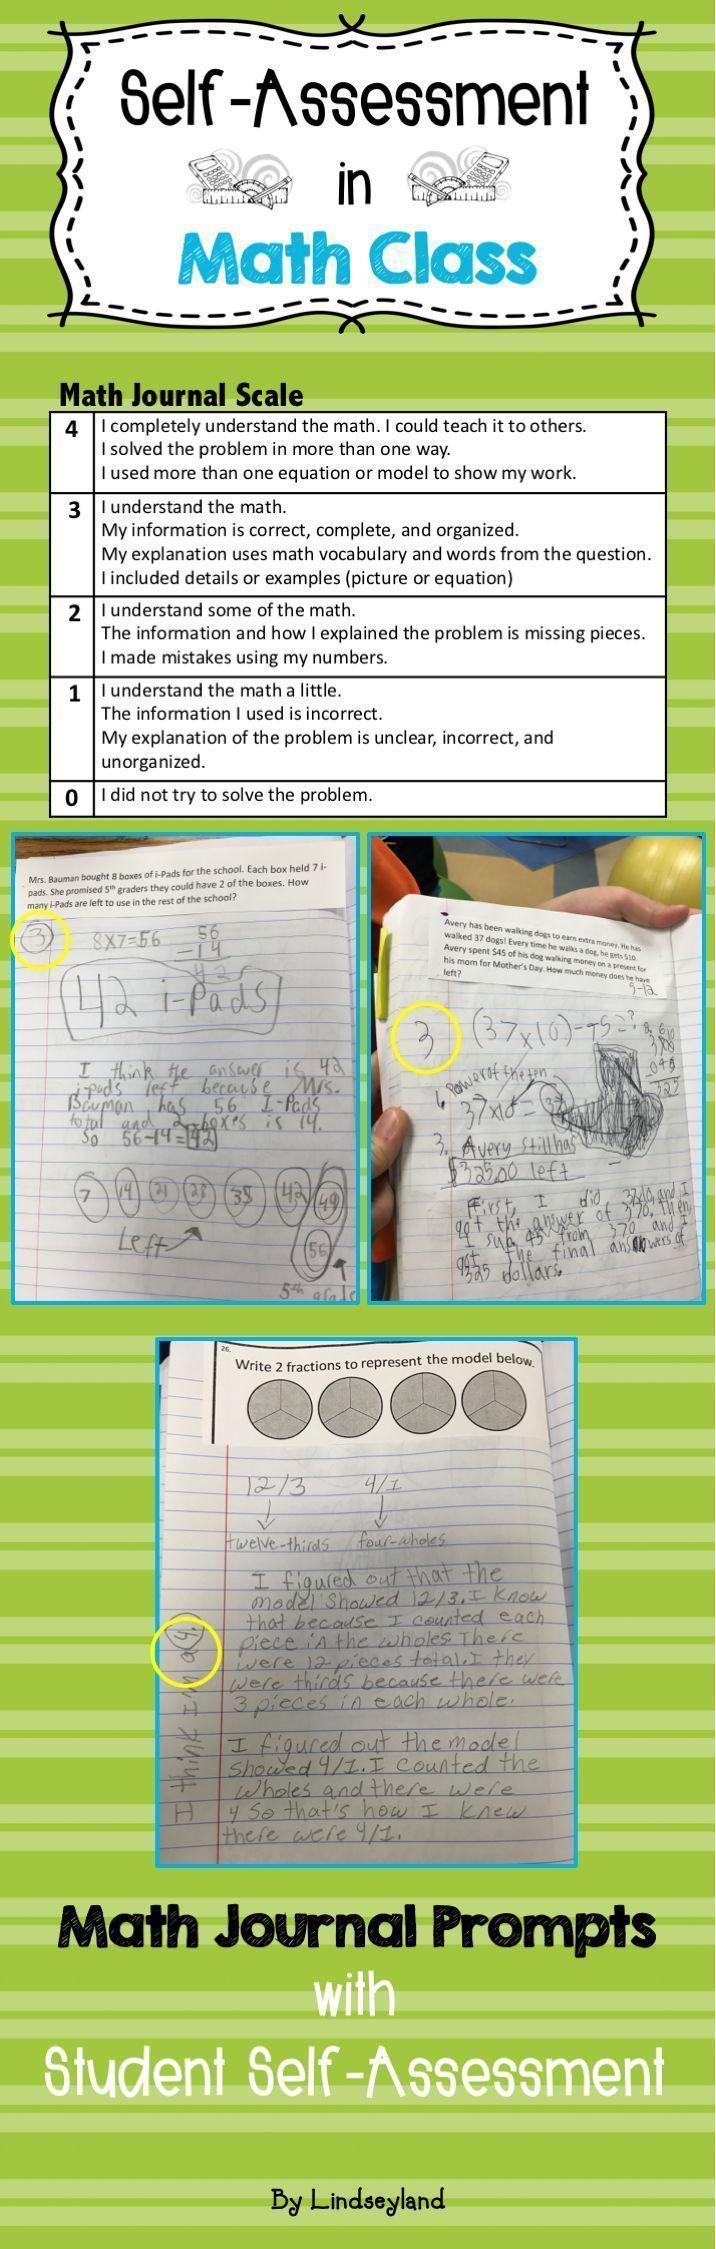 best ideas about self assessment student self problem solving journal prompts bundle